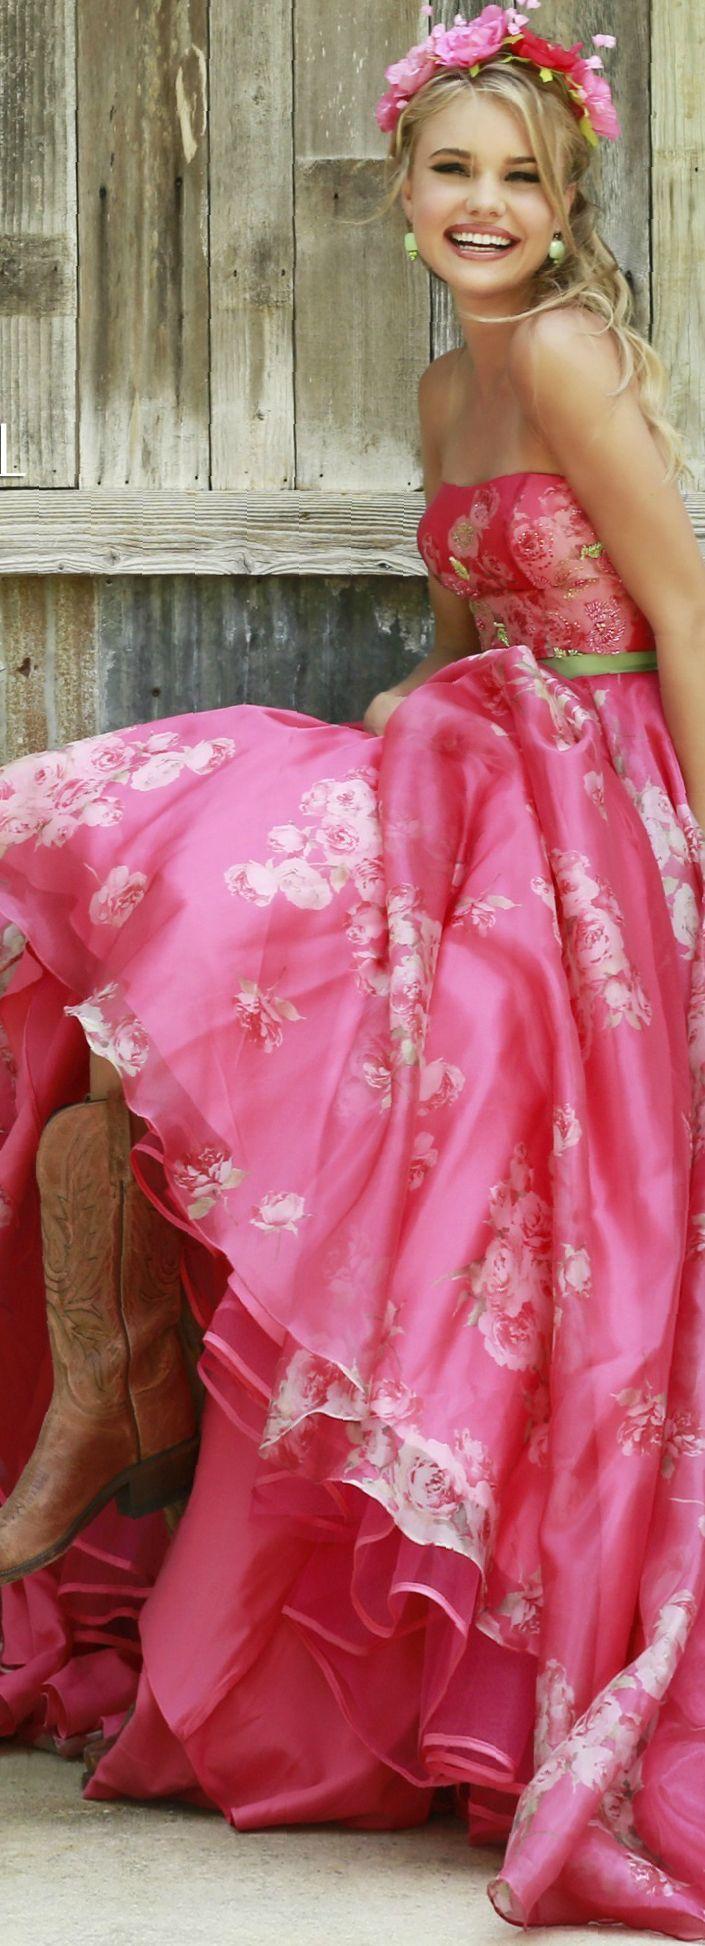 Sherri Hill | Pink | Pinterest | Rosas, Fucsia y Rosas fucsia